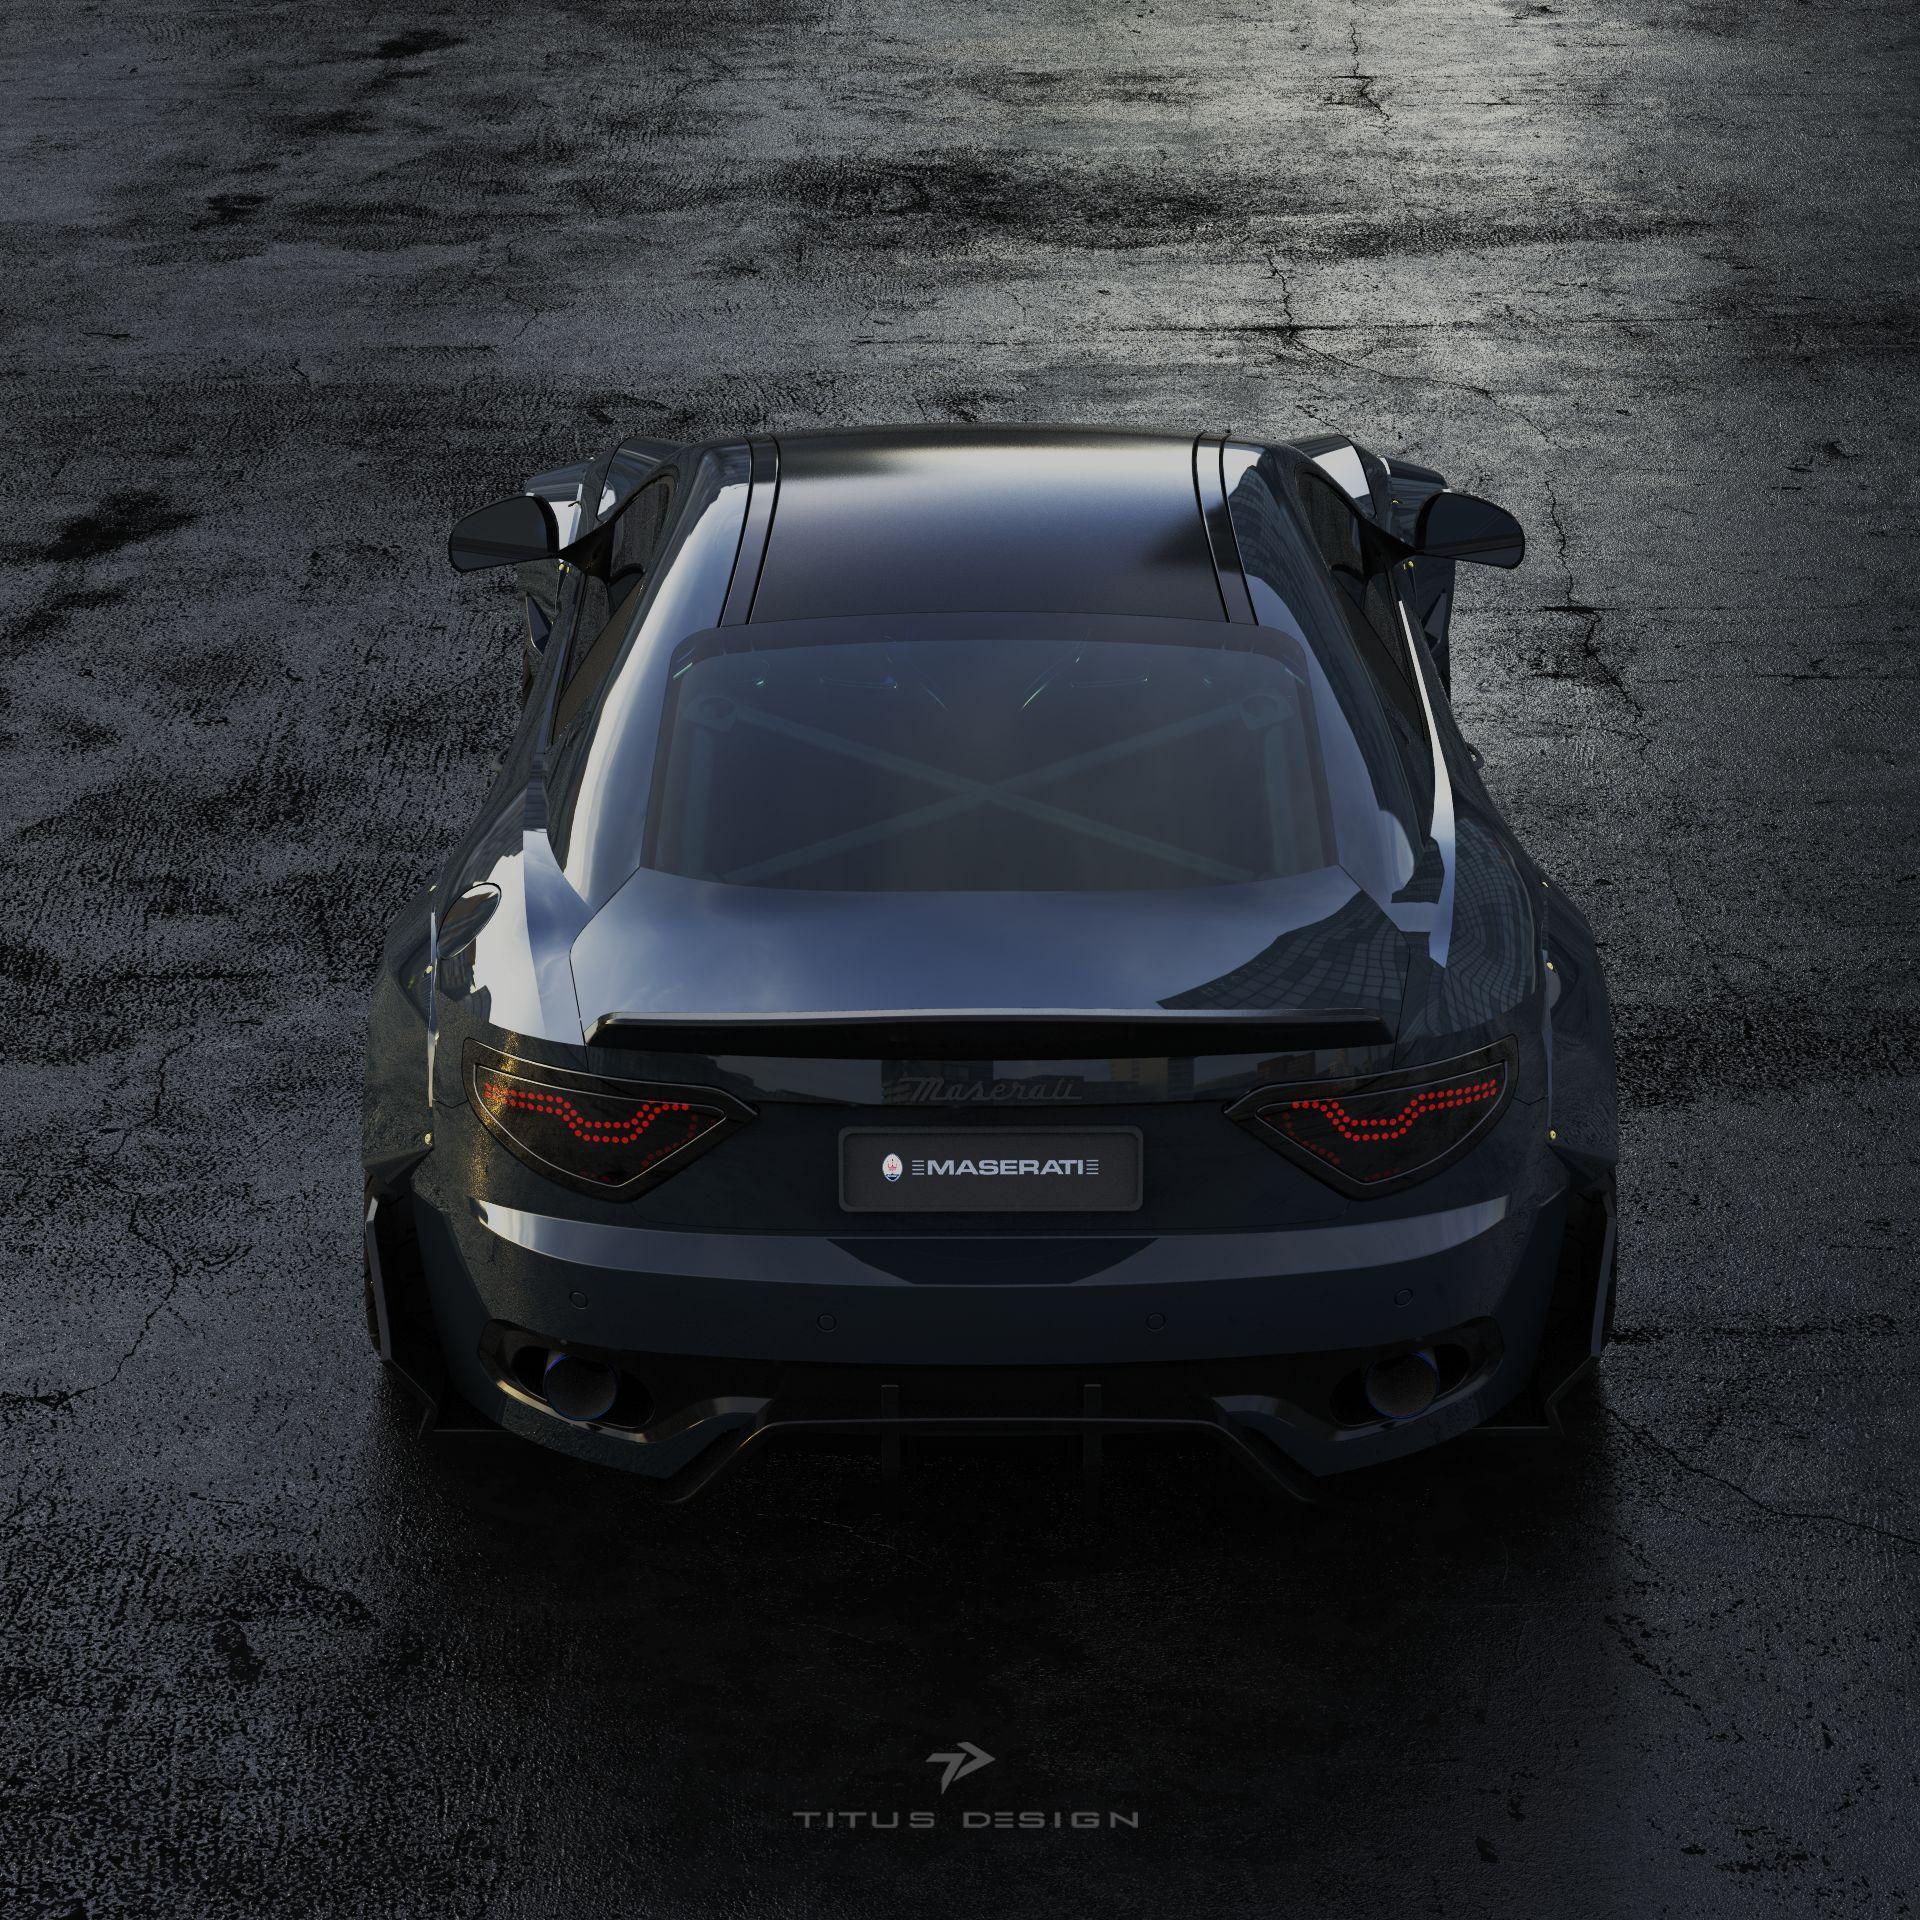 Maserati-gt-16-9-3500-3500